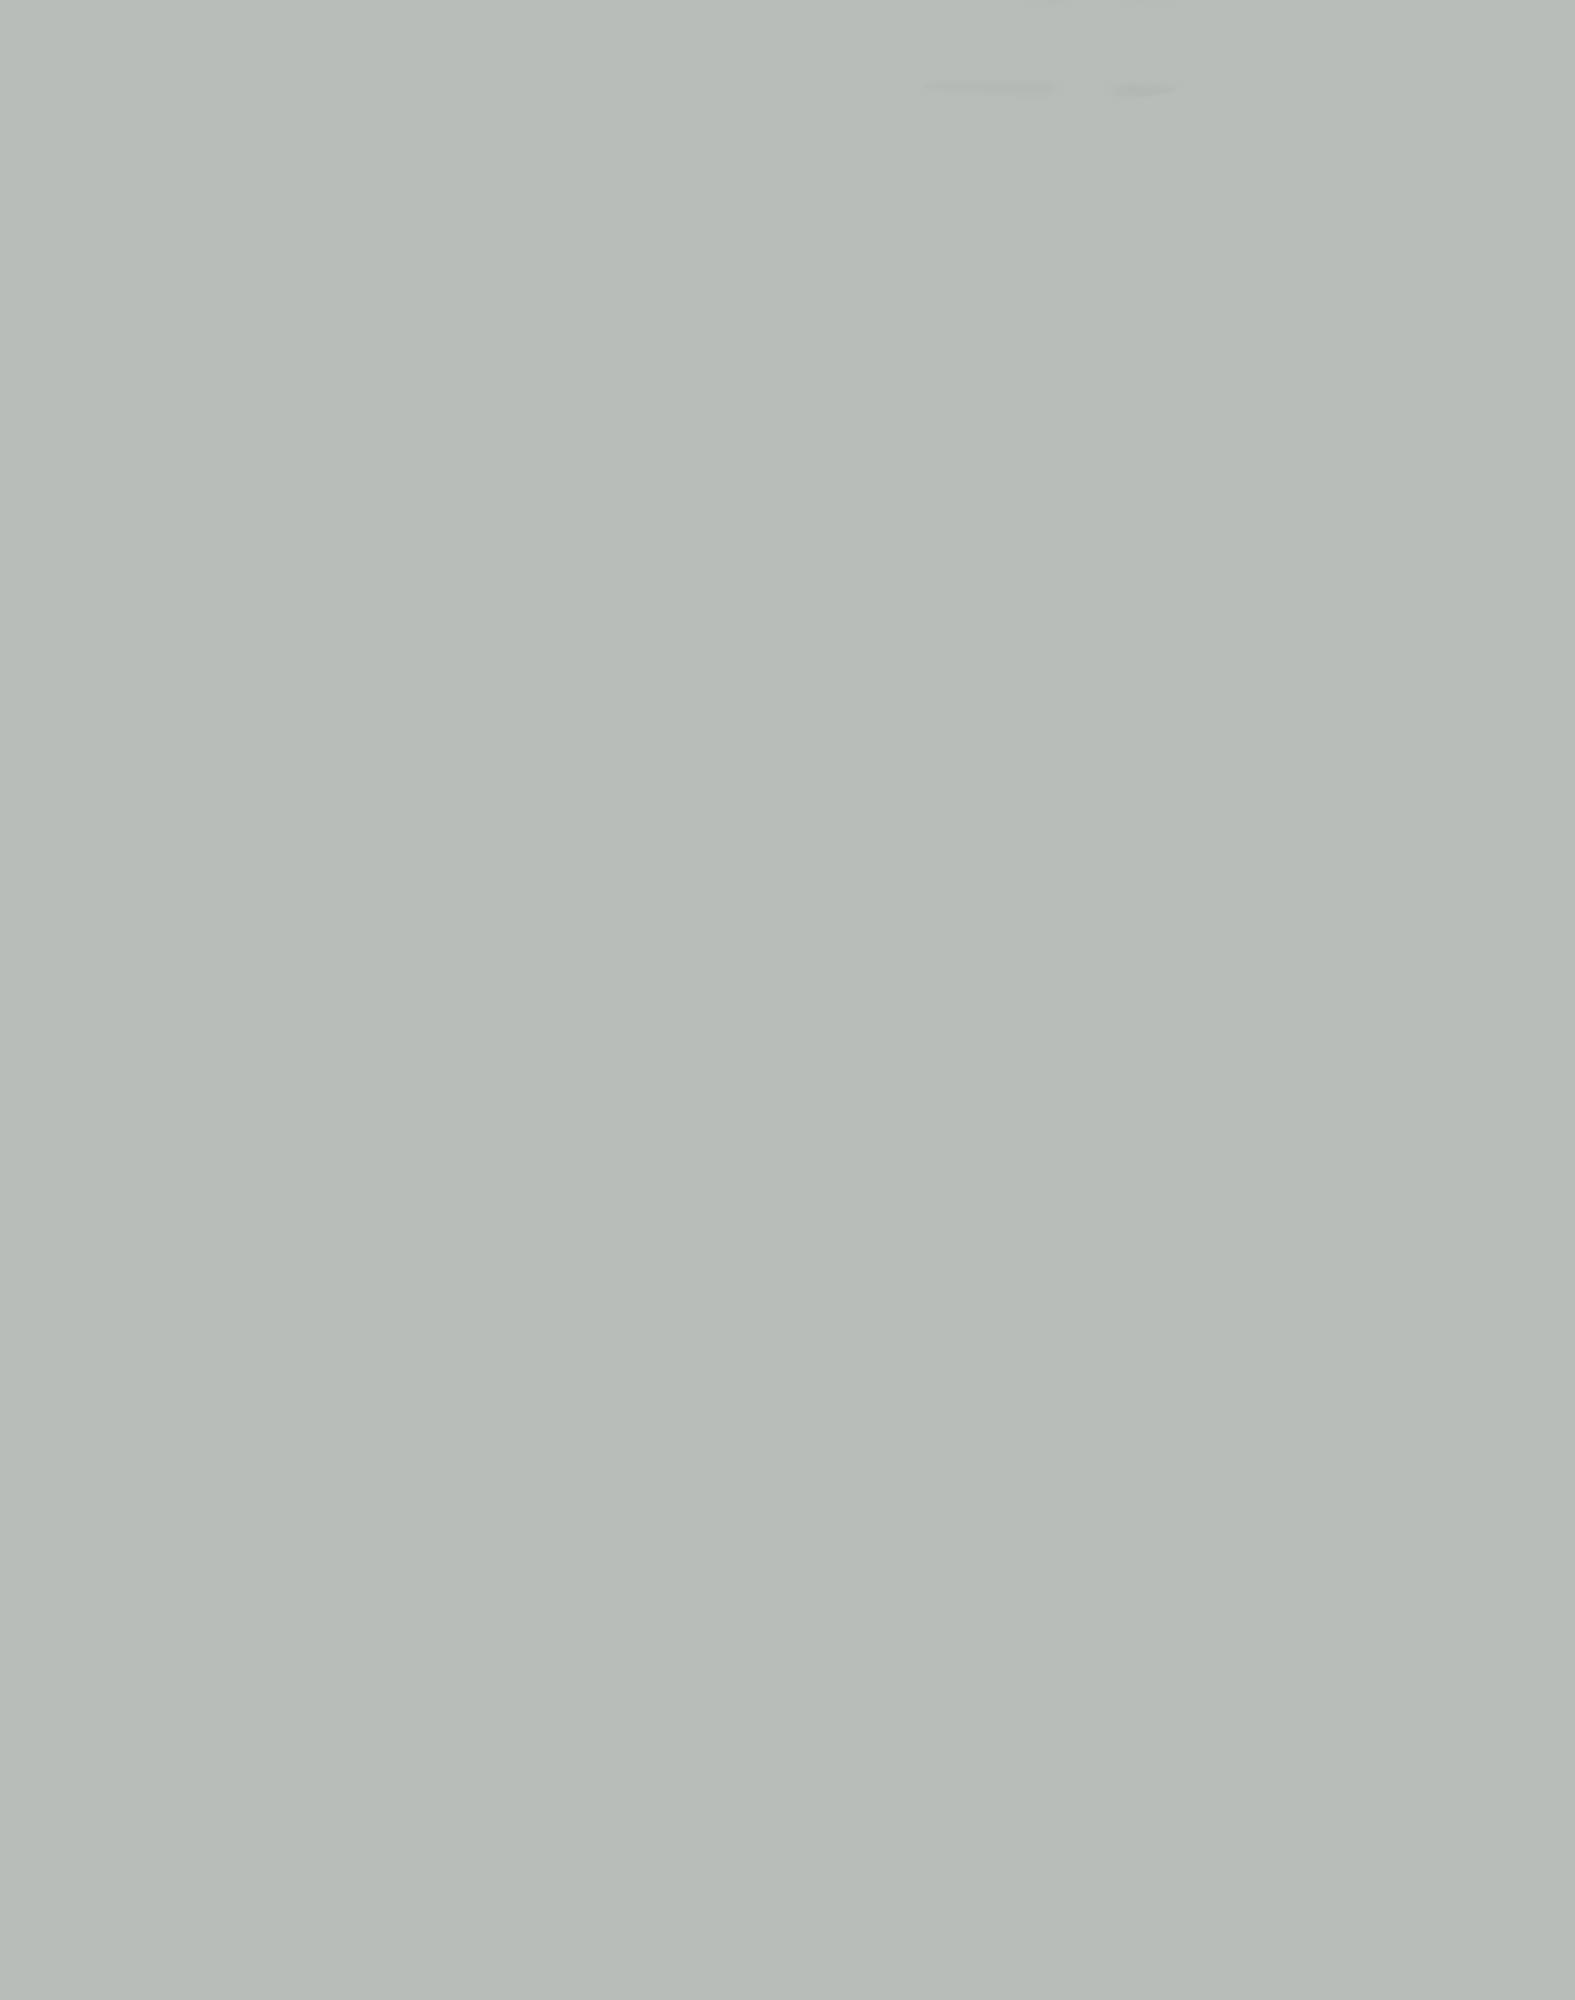 Pale Grey  184,189,186